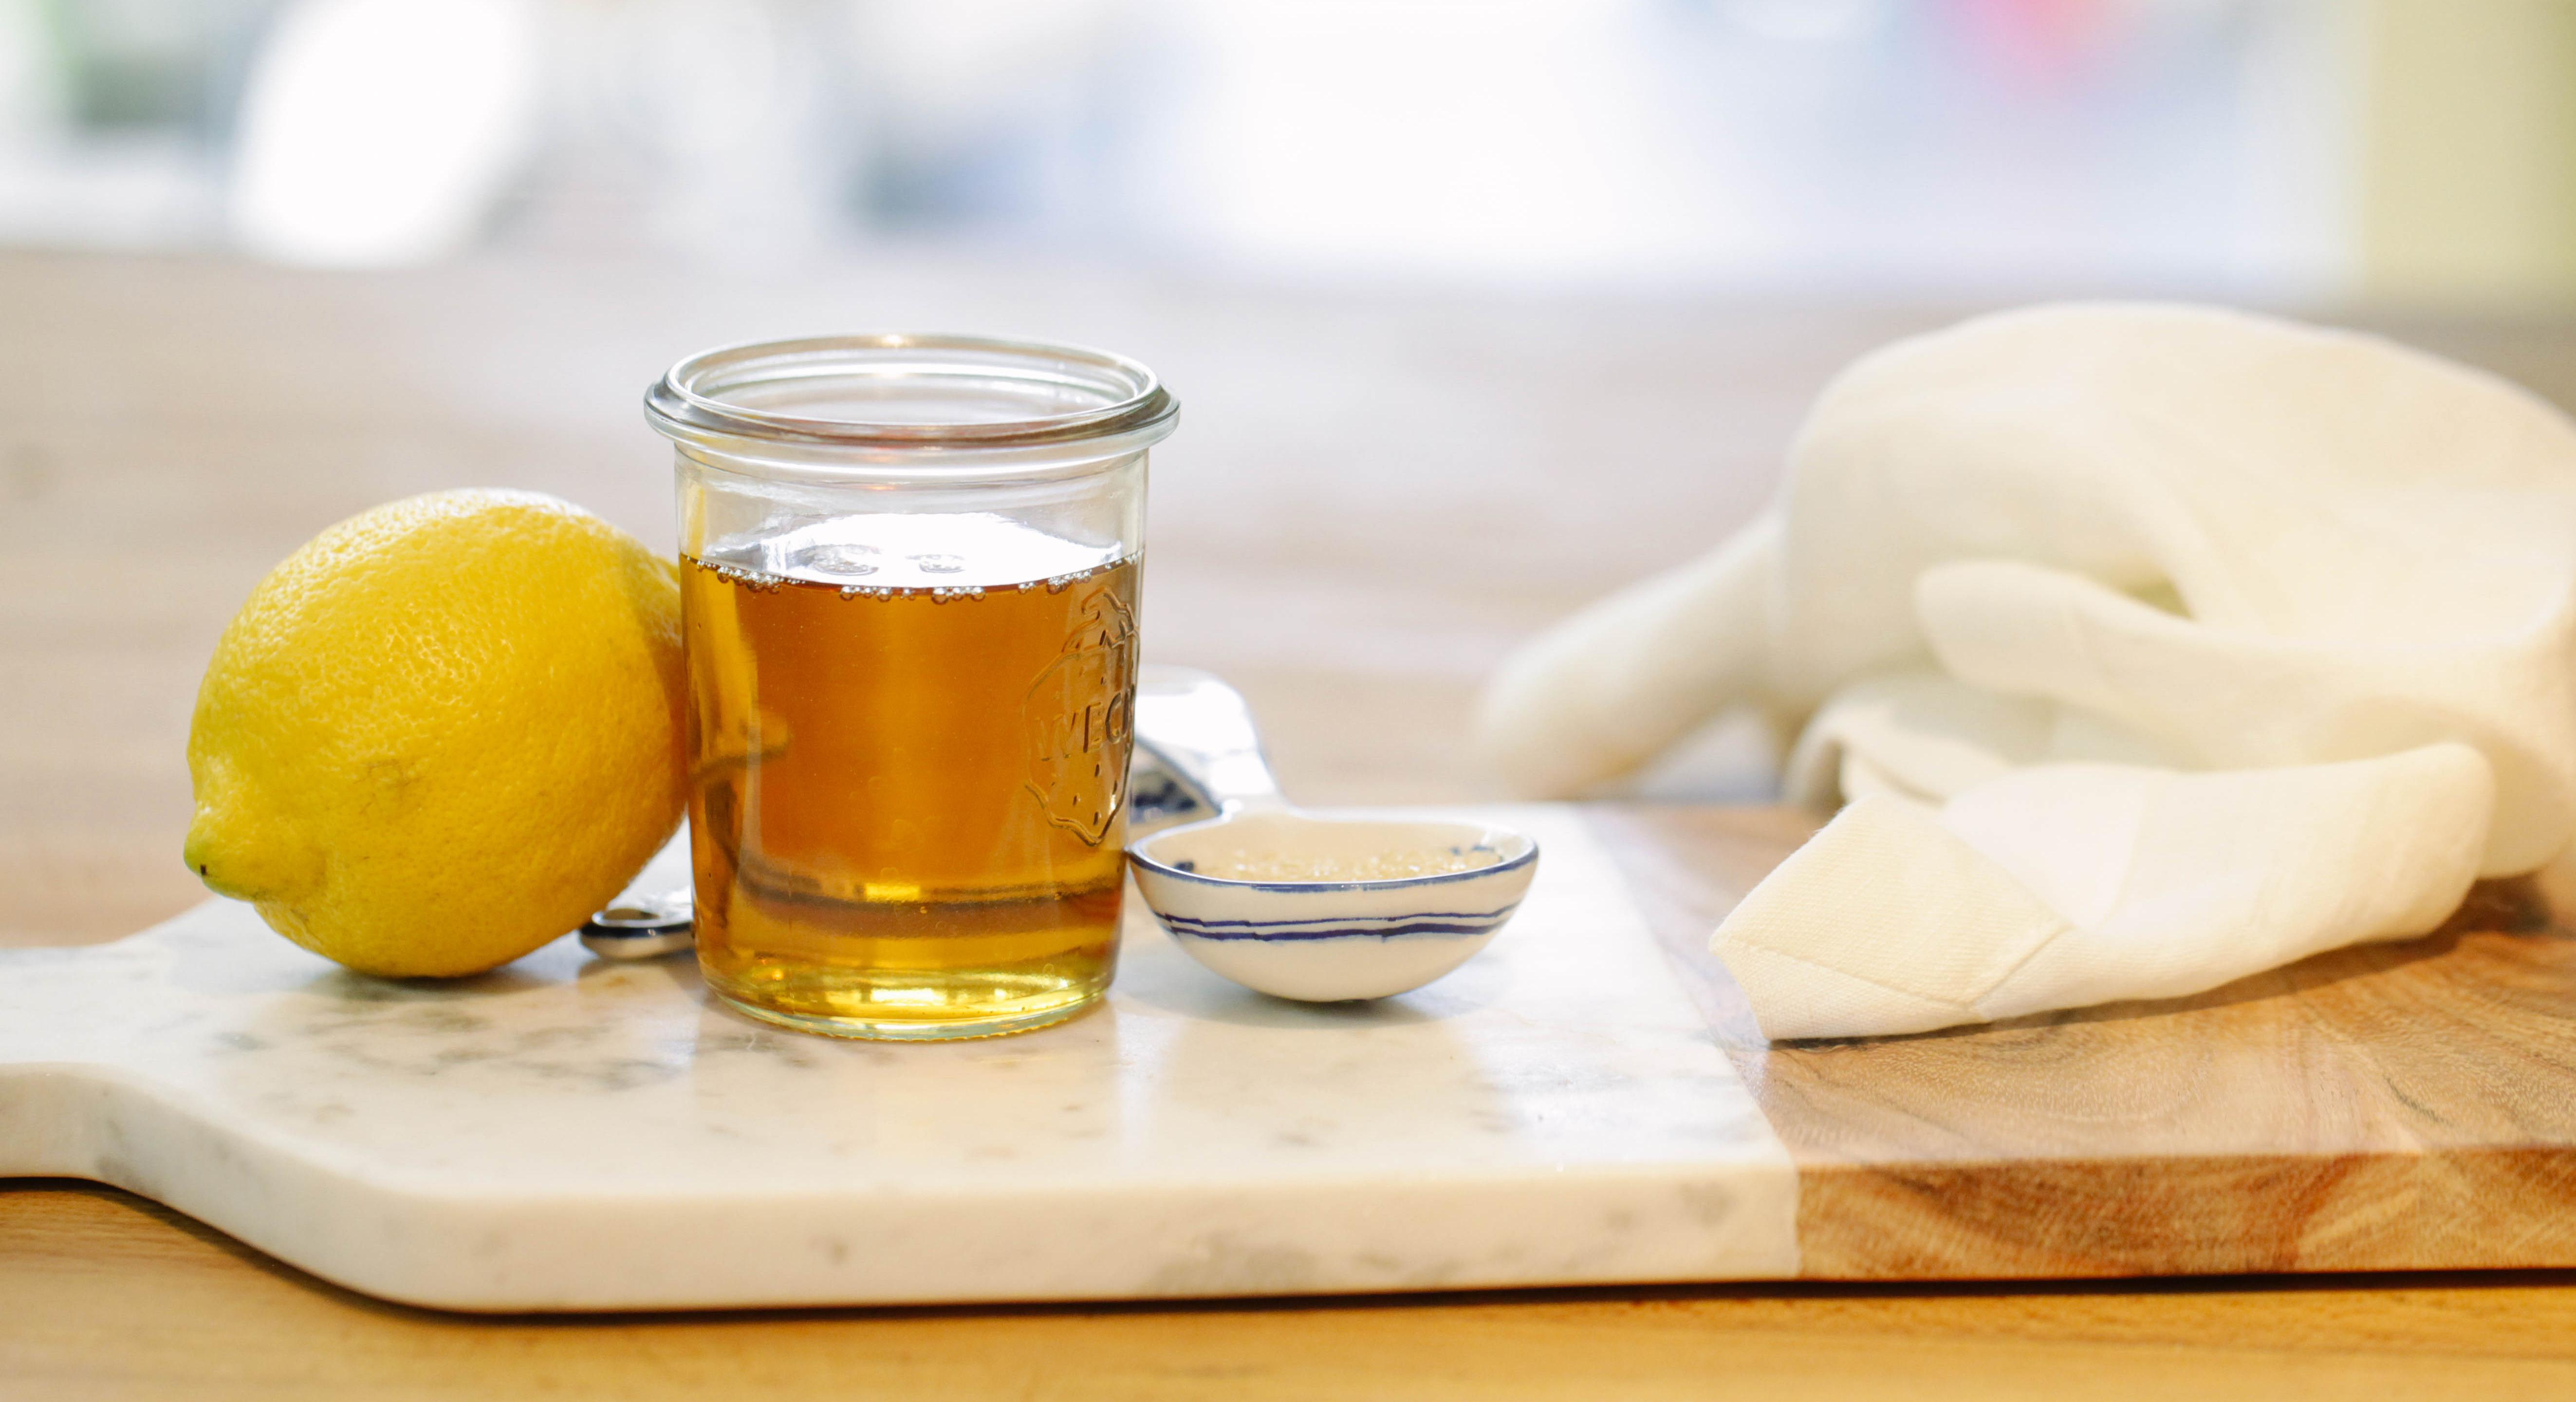 Agave Nectar: A Natural Alternative to Sugar